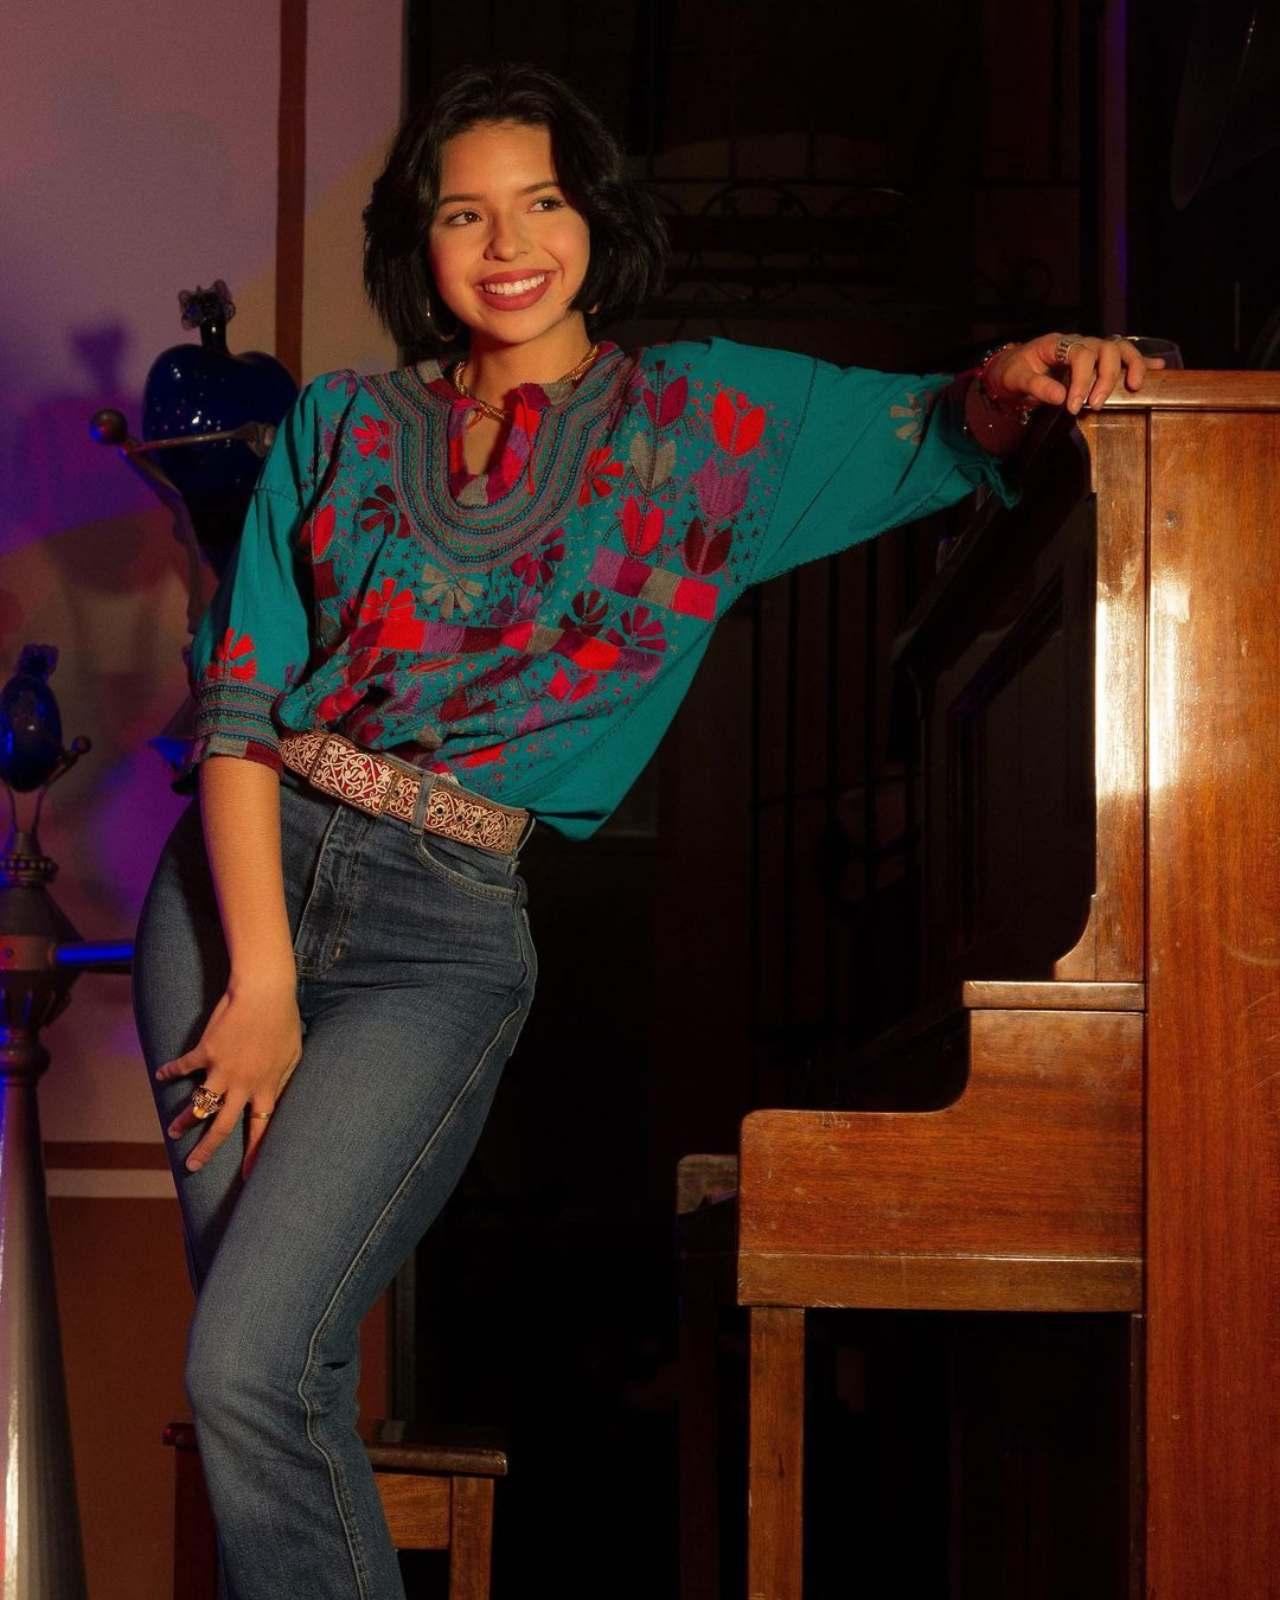 Angela Aguilar jeans blusa bordada mexicana